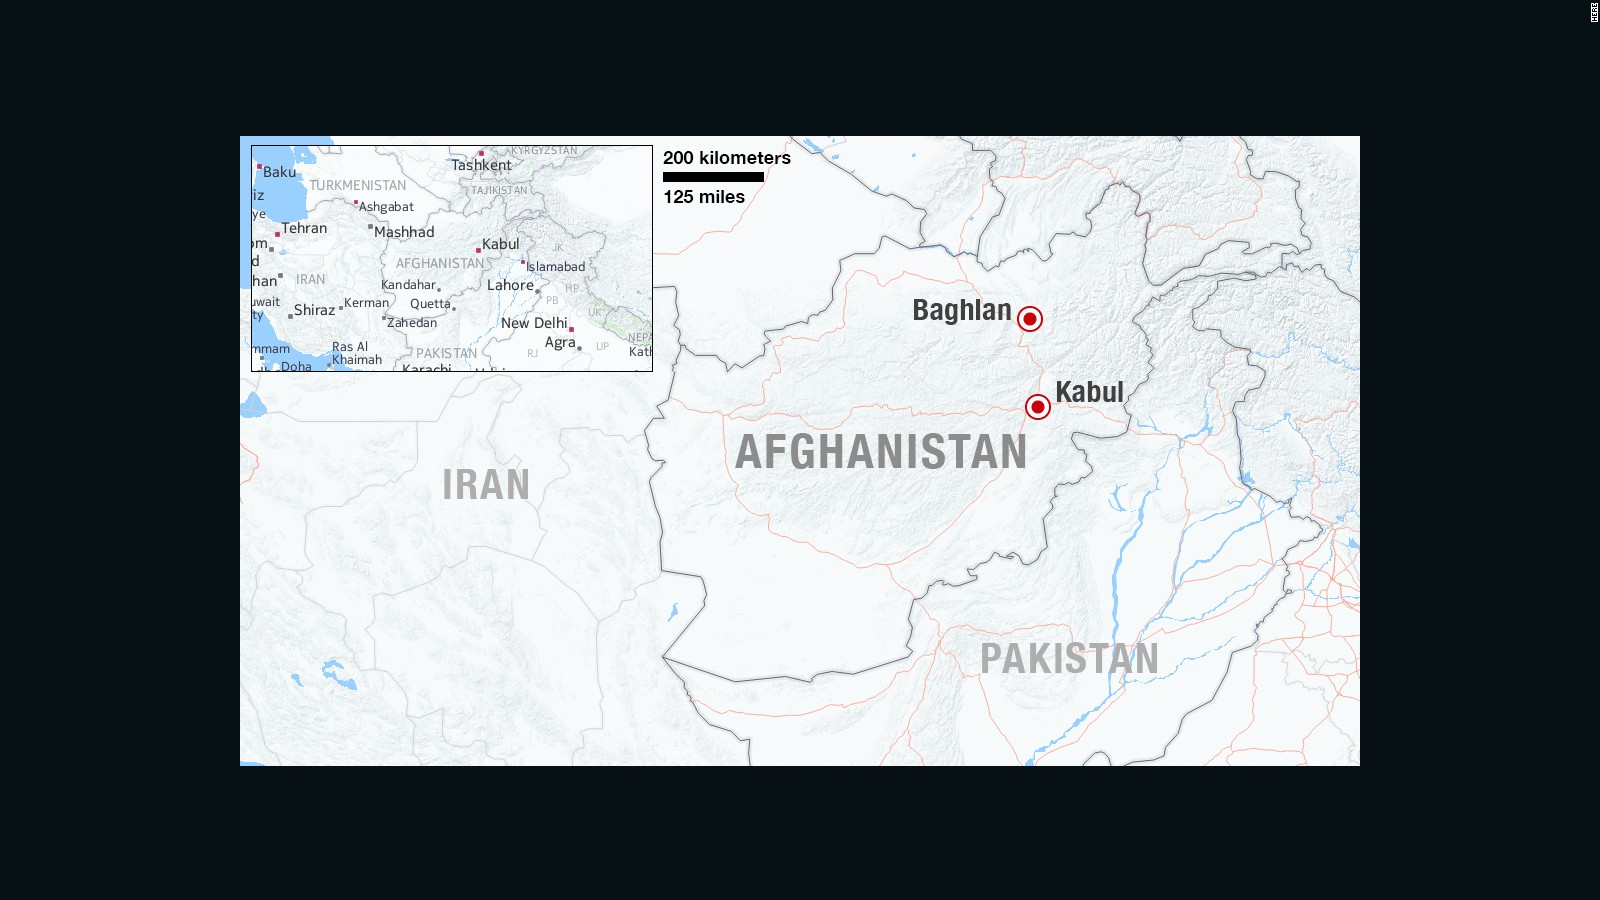 Afghanistan wedding shooting kills 21 - CNN.com